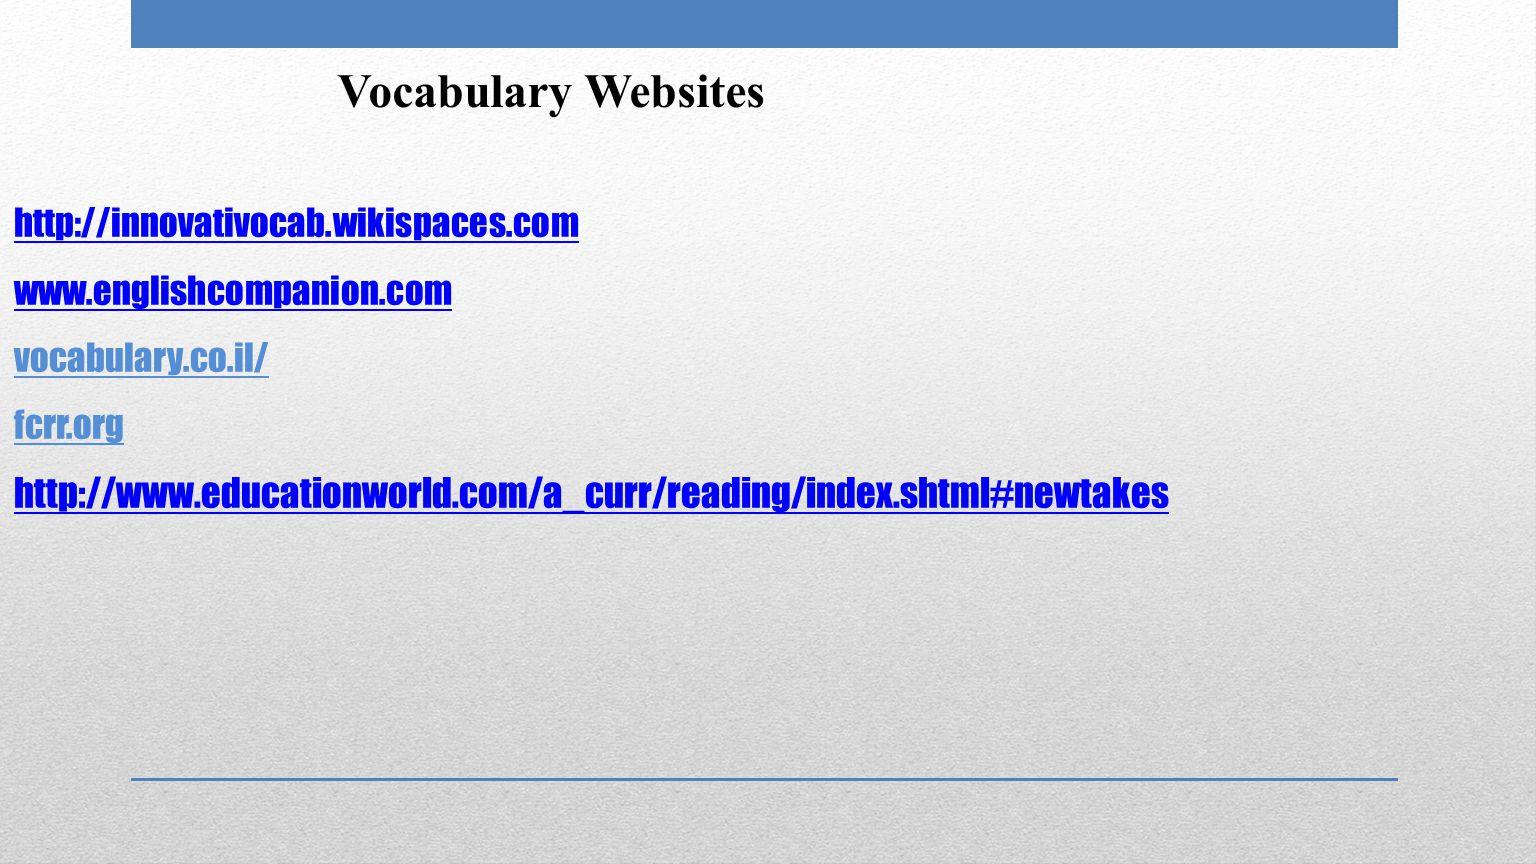 http://innovativocab.wikispaces.com www.englishcompanion.com http://innovativocab.wikispaces.com www.englishcompanion.com vocabulary.co.il/ fcrr.org http://www.educationworld.com/a_curr/reading/index.shtml#newtakes http://www.educationworld.com/a_curr/reading/index.shtml#newtakes Vocabulary Websites